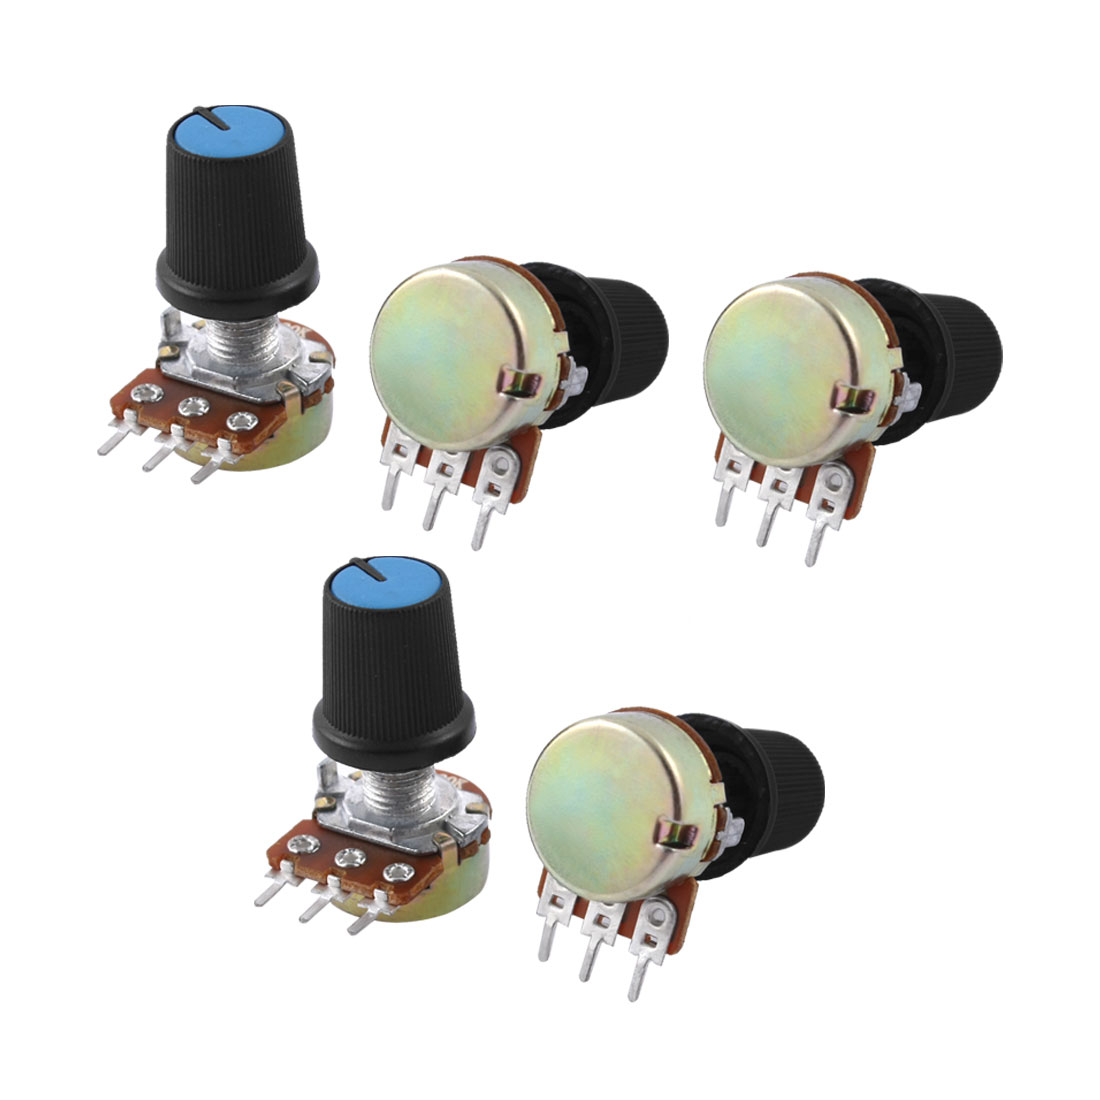 5 Pcs B100K 100K Ohm 3 Terminals Rotary Audio Single Linear Potentiometer Pot